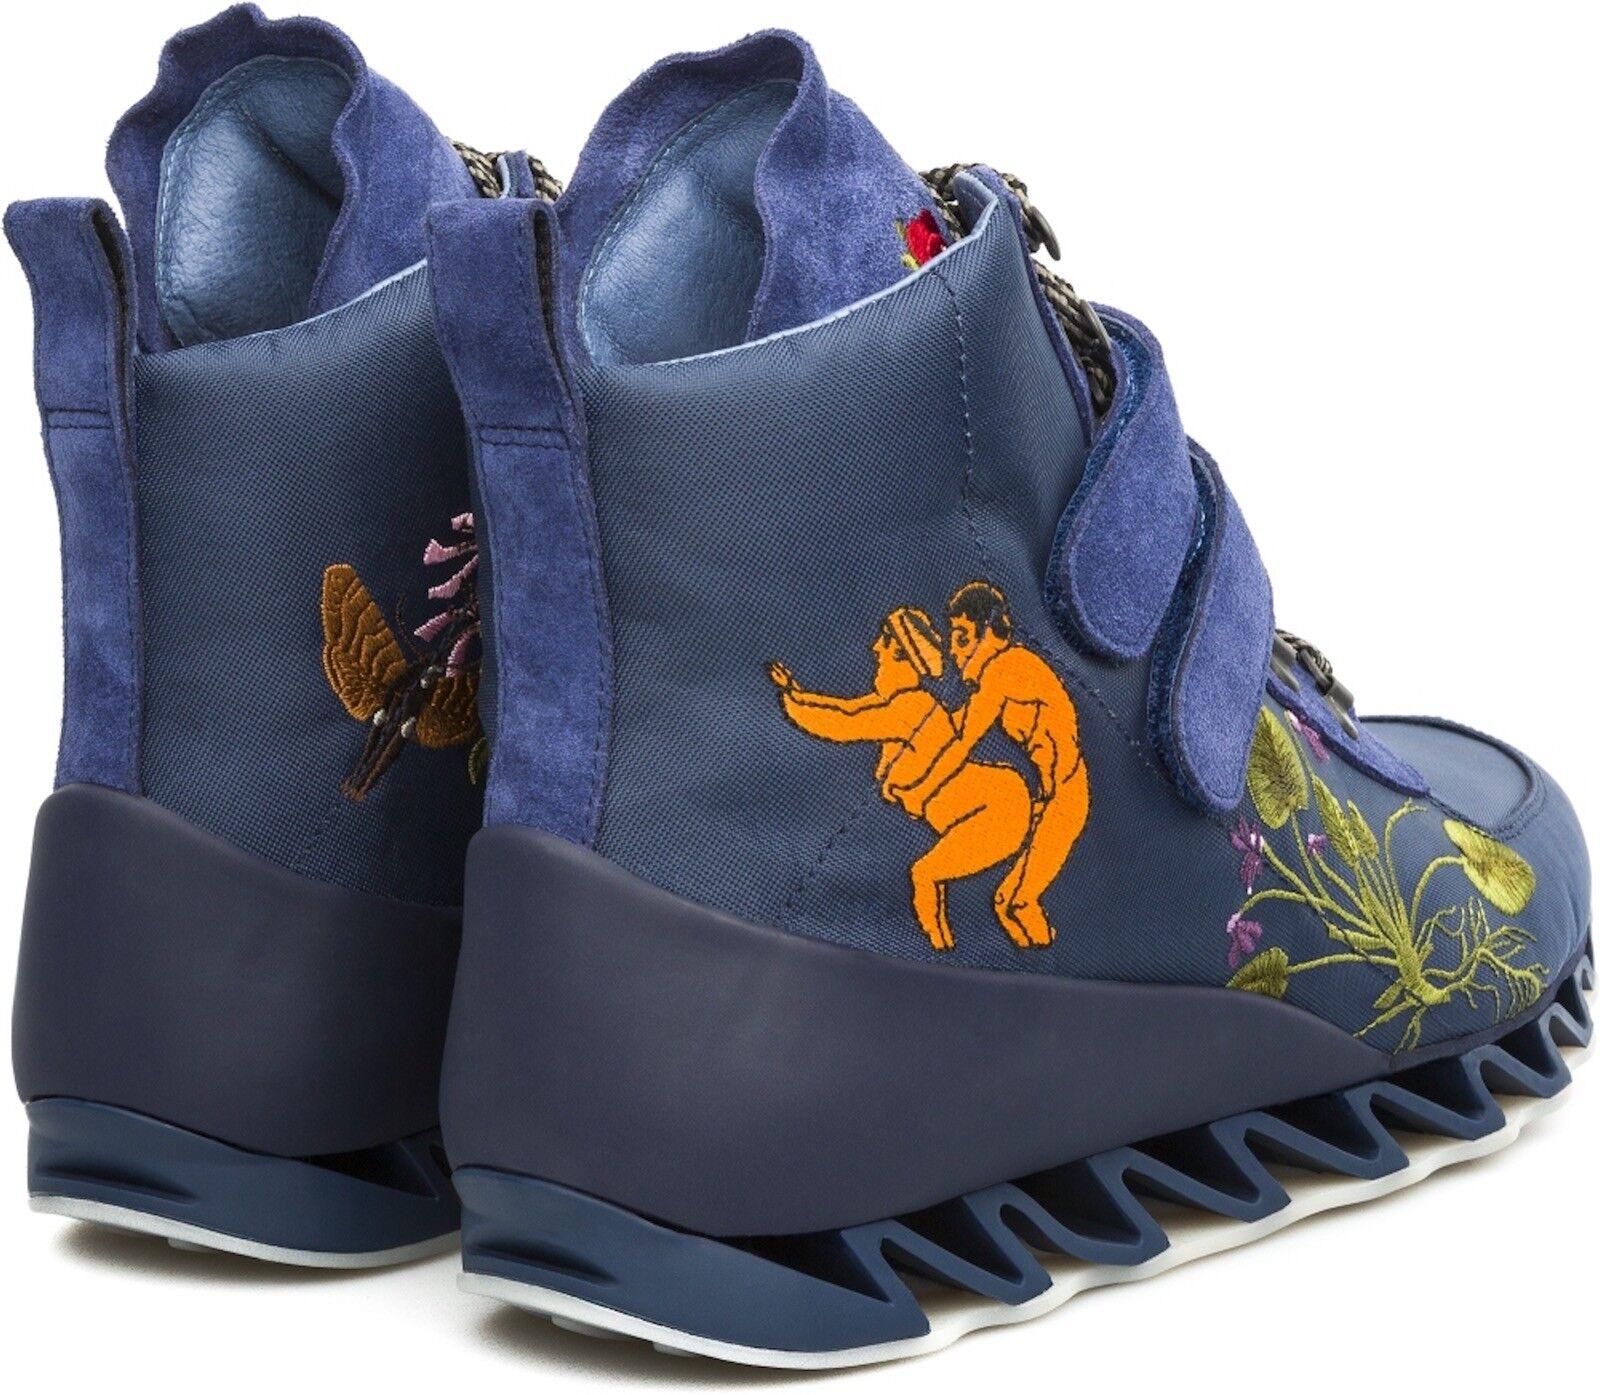 Bernhard Willhelm X Camper US 7 Together Himalayan Sneakers 36754-002